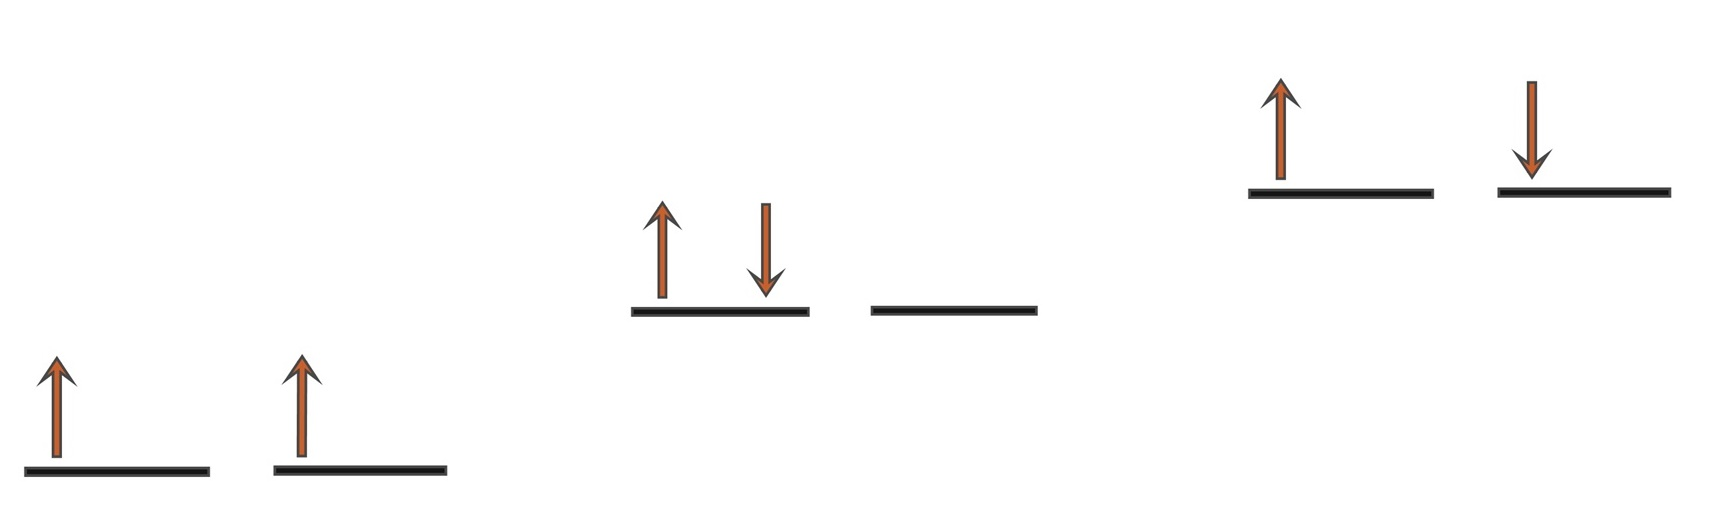 Chem1902 oxygen mo diagram for 2e 2o pooptronica Gallery